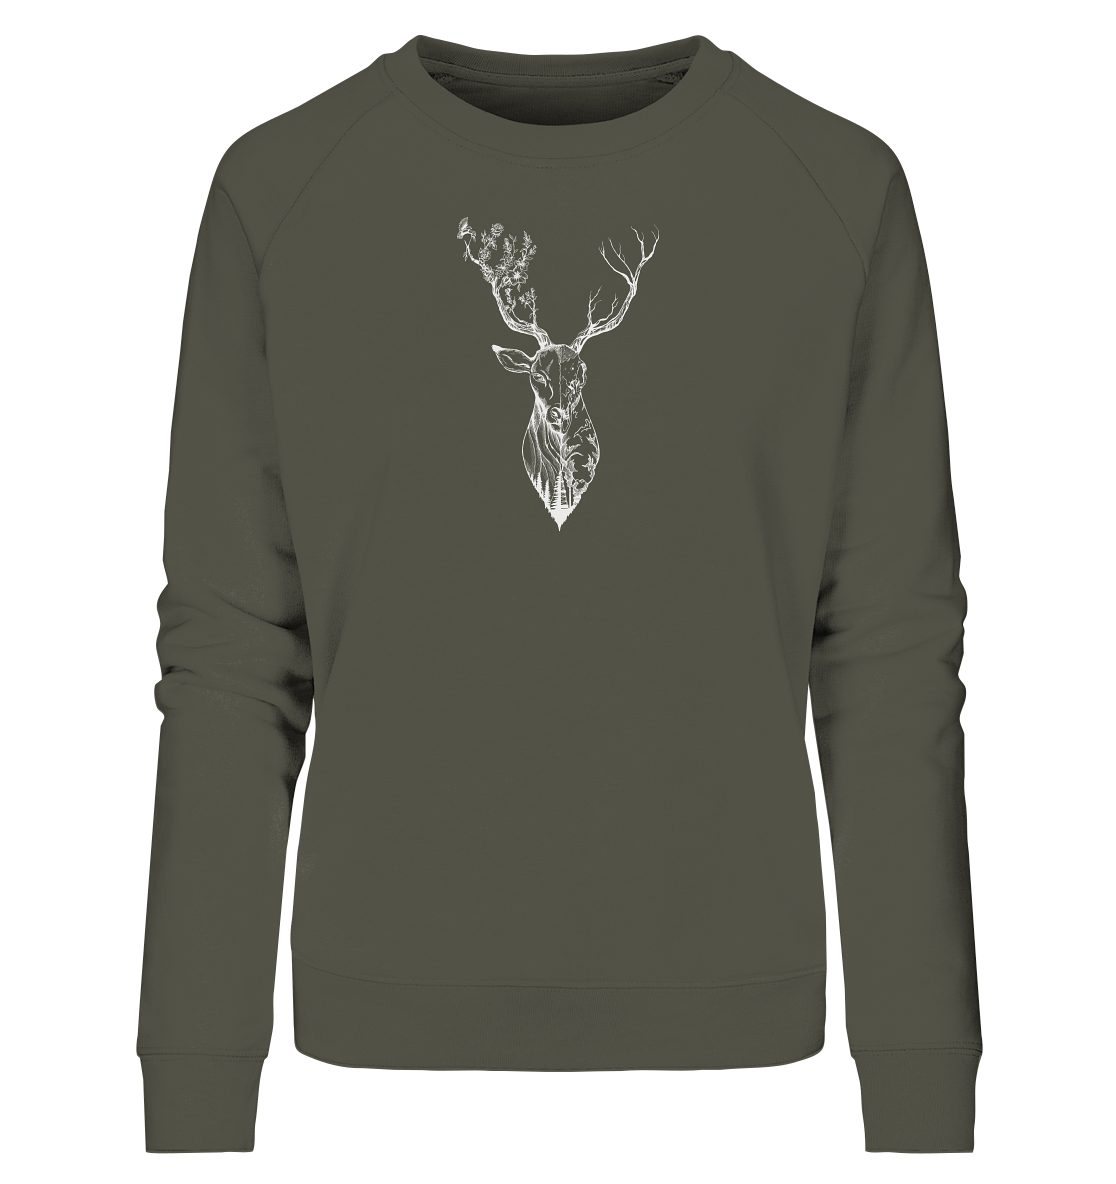 front-ladies-organic-sweatshirt-545348-1116x-7.png